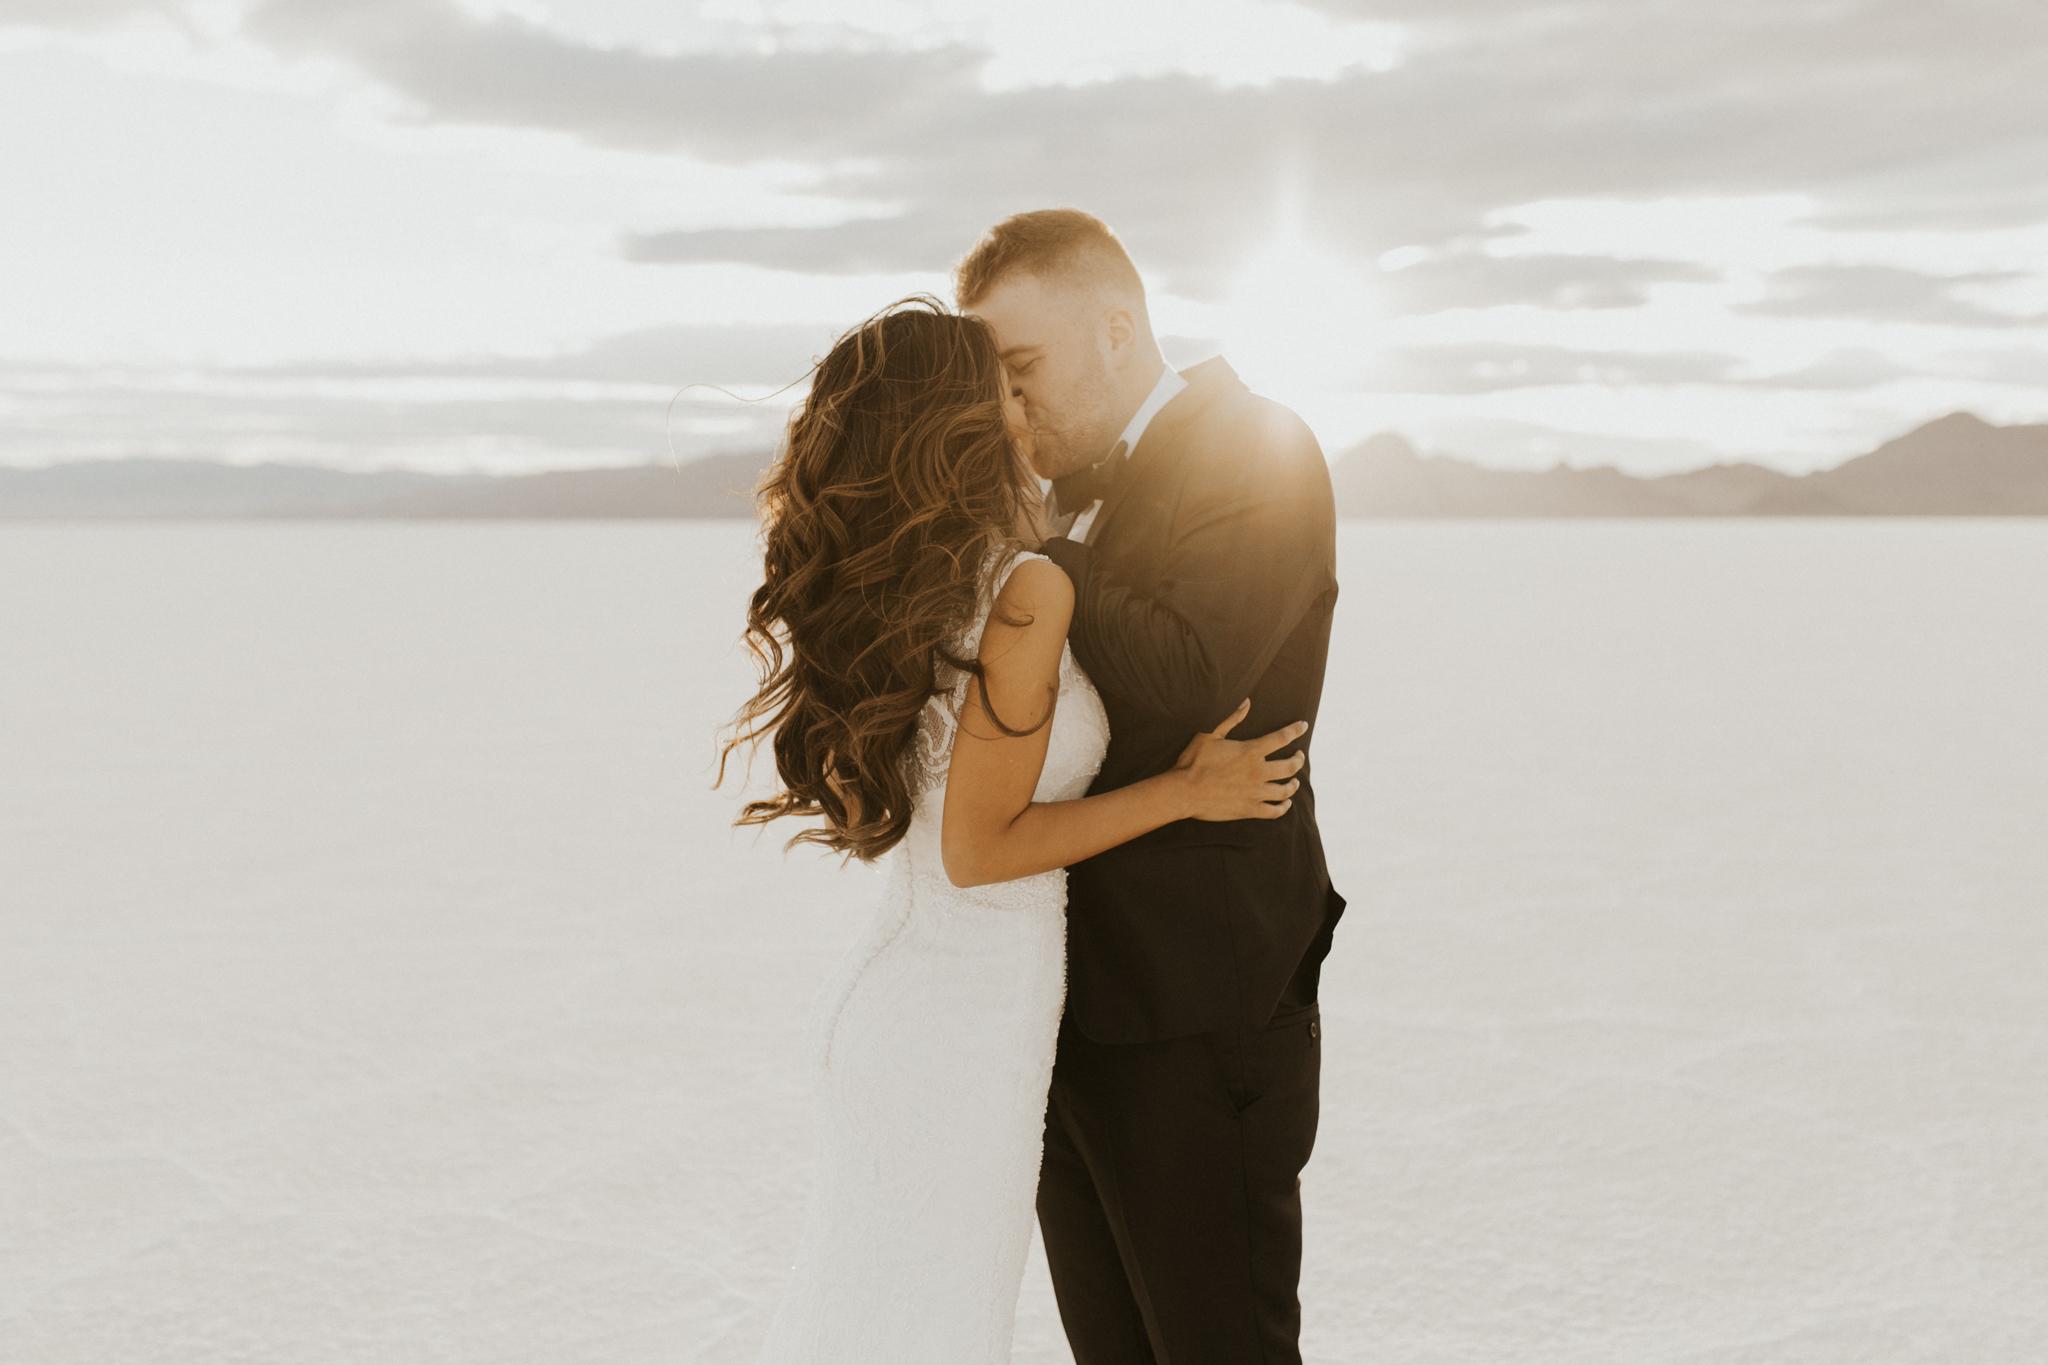 bonnevill salt flats bridal session